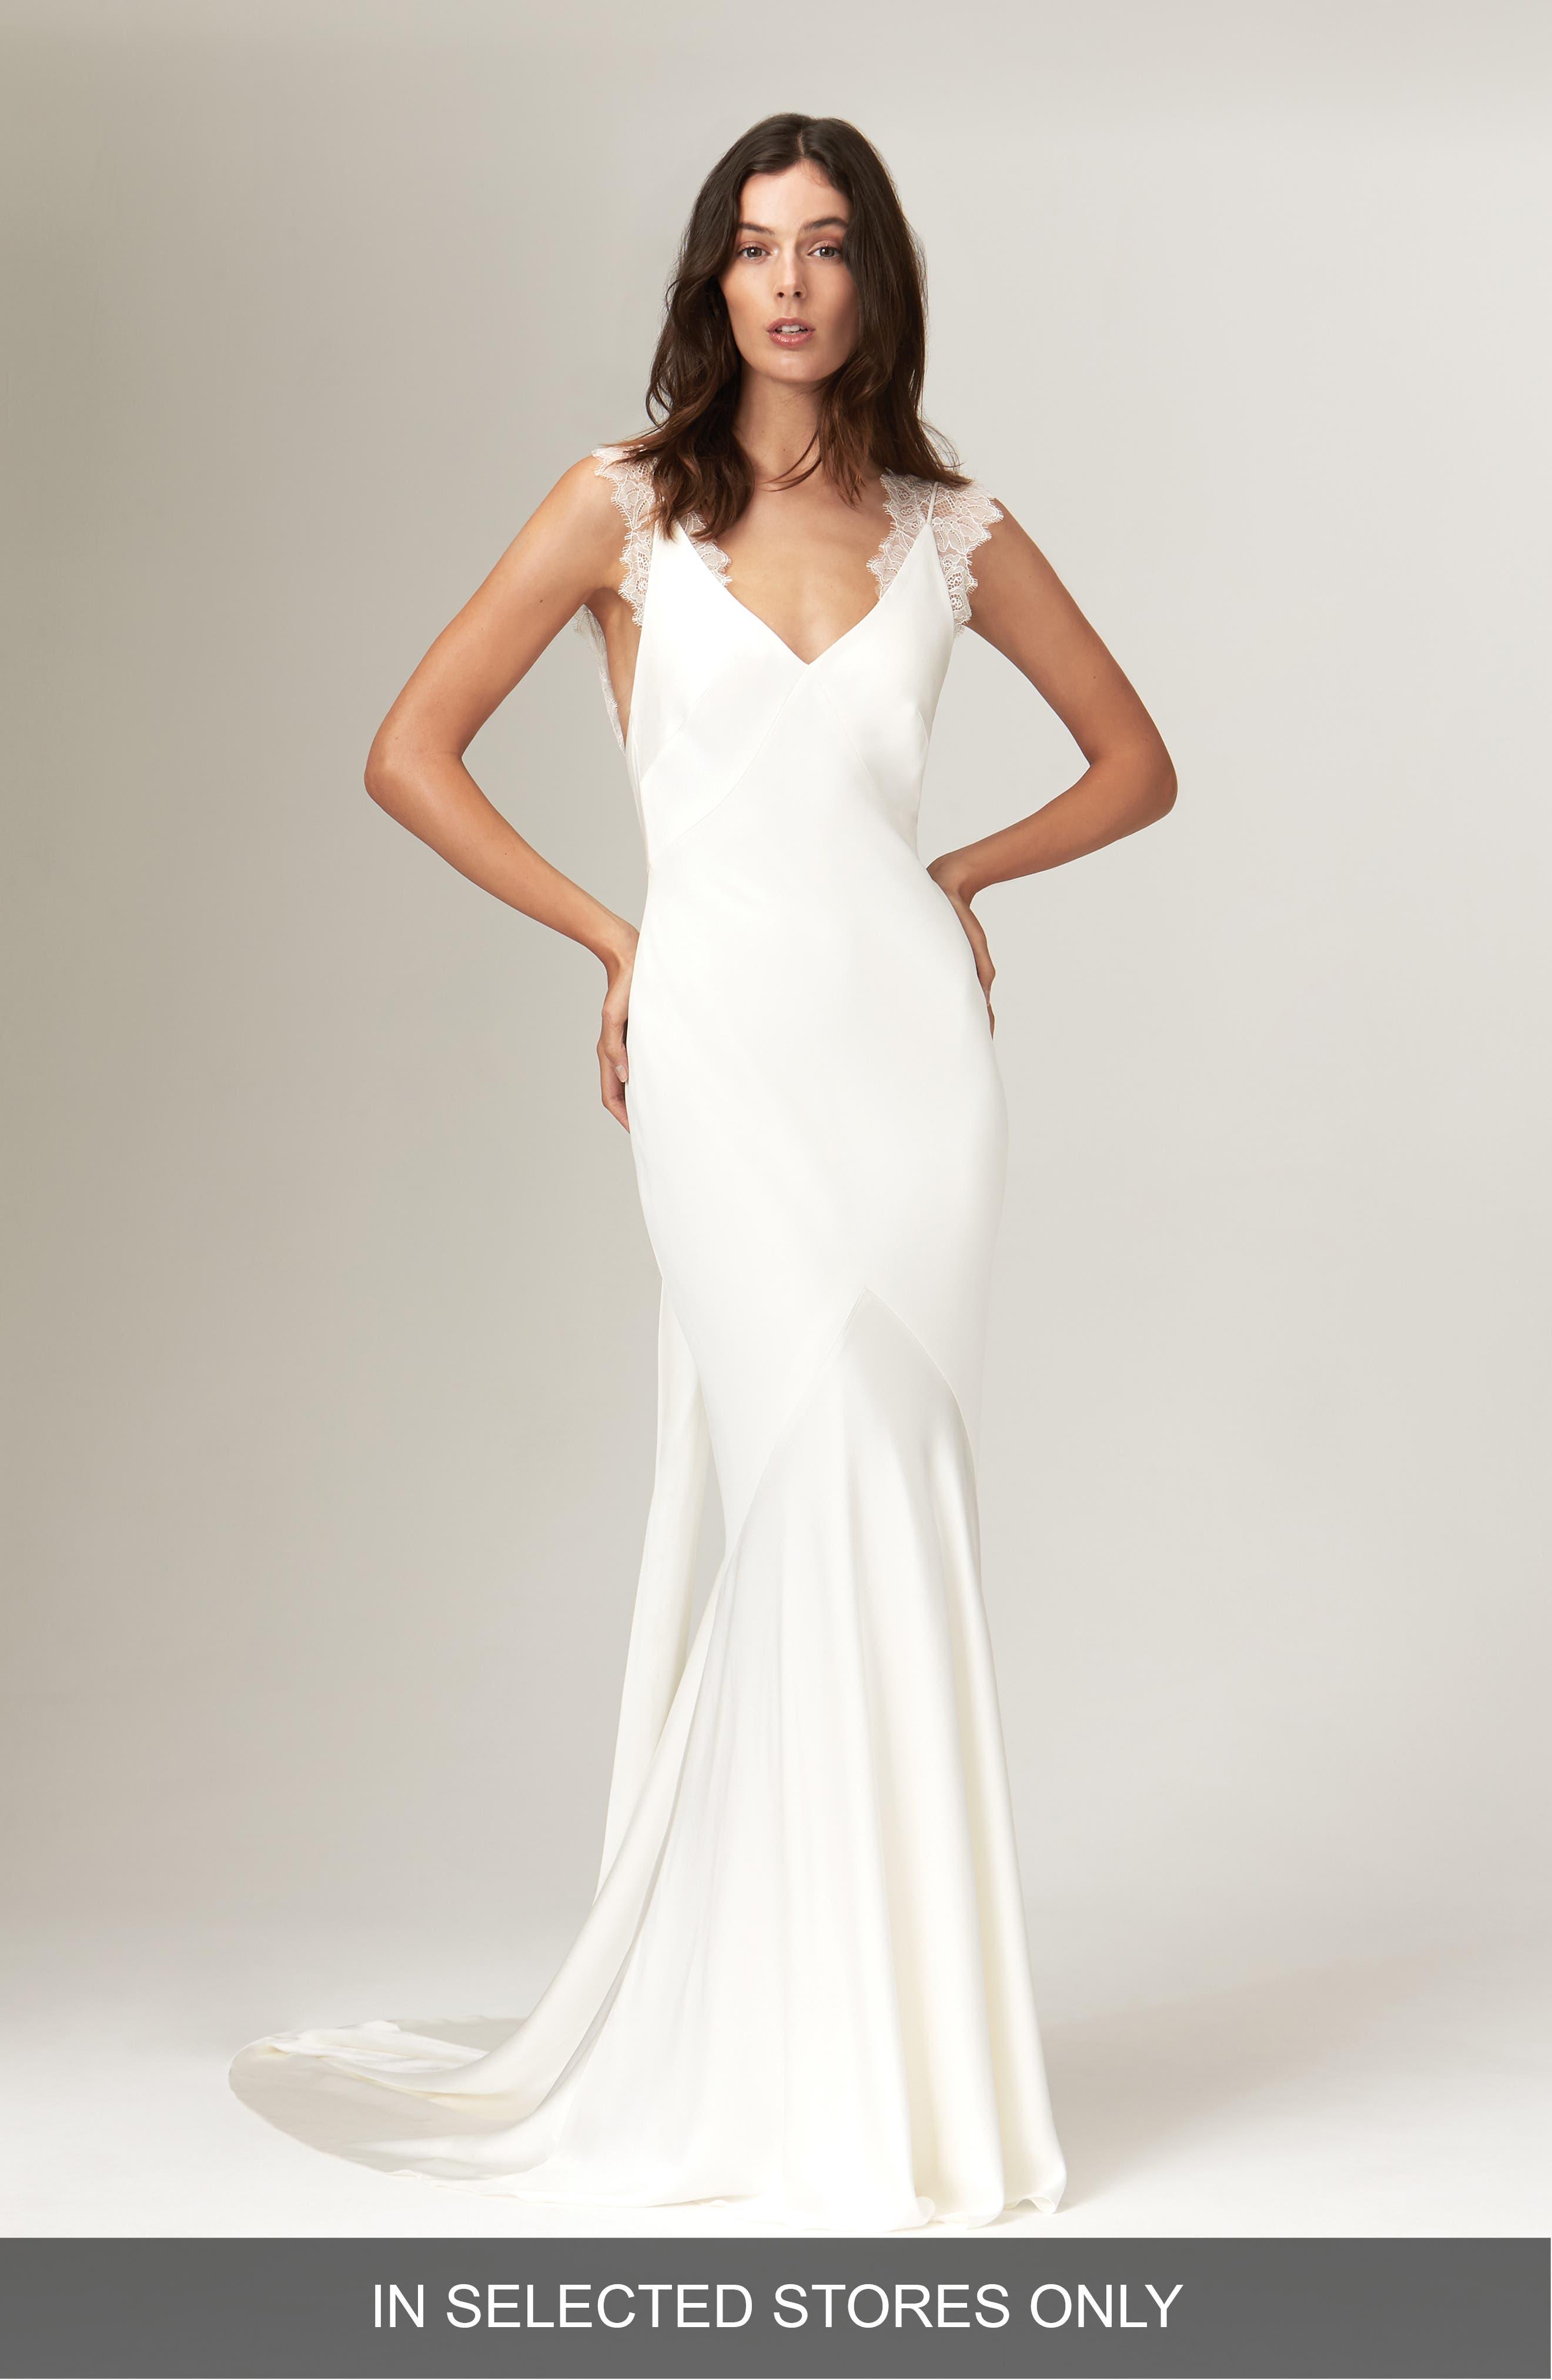 Alma Satin V-Neck Lace Detail Wedding Dress in Ivory